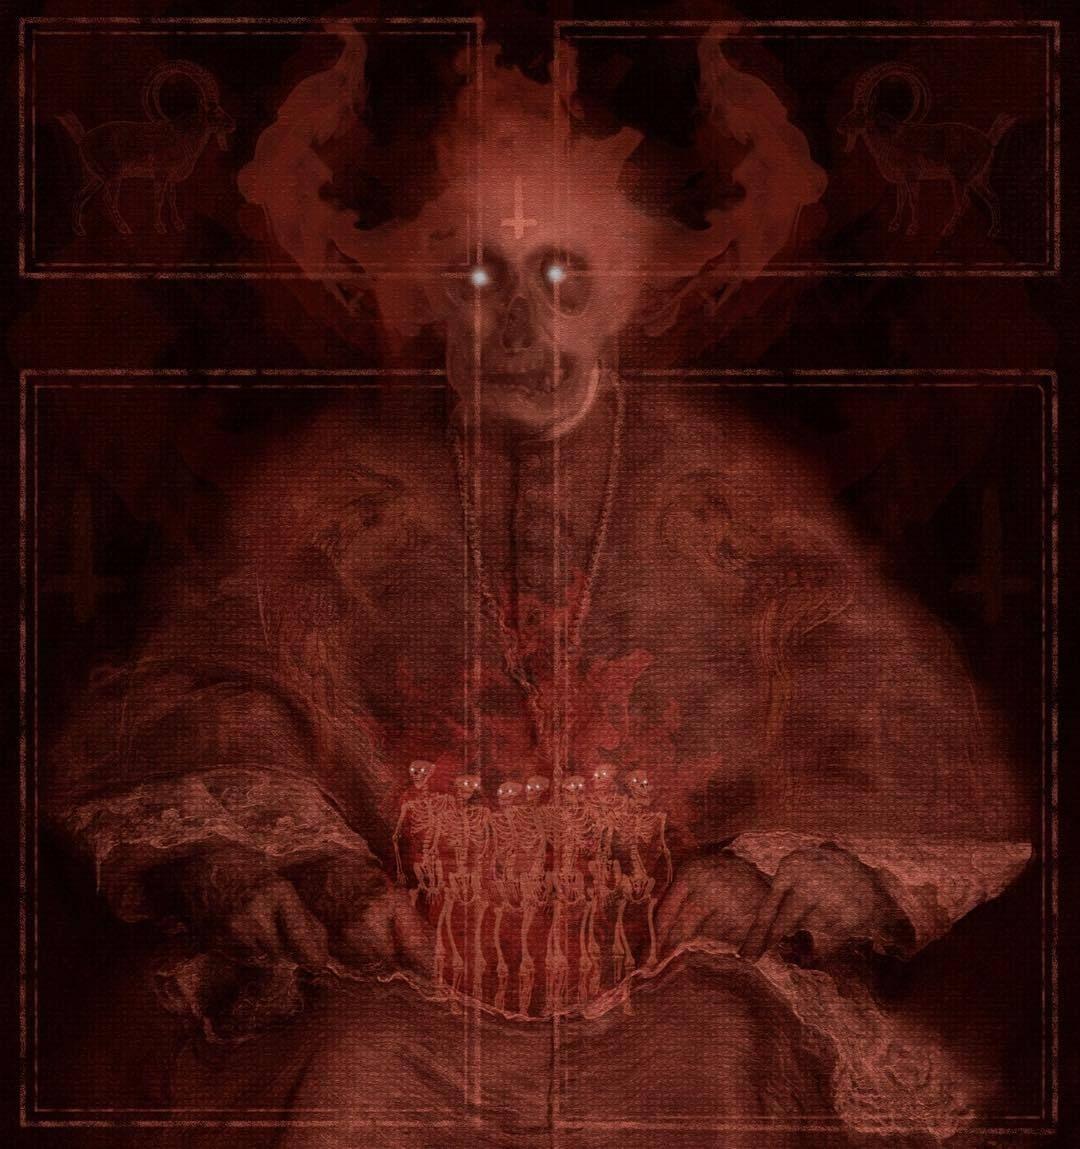 #illustration #weirdart #felipefroeder #skeletons #demonic #e #darkart #darksurrealism #surreal